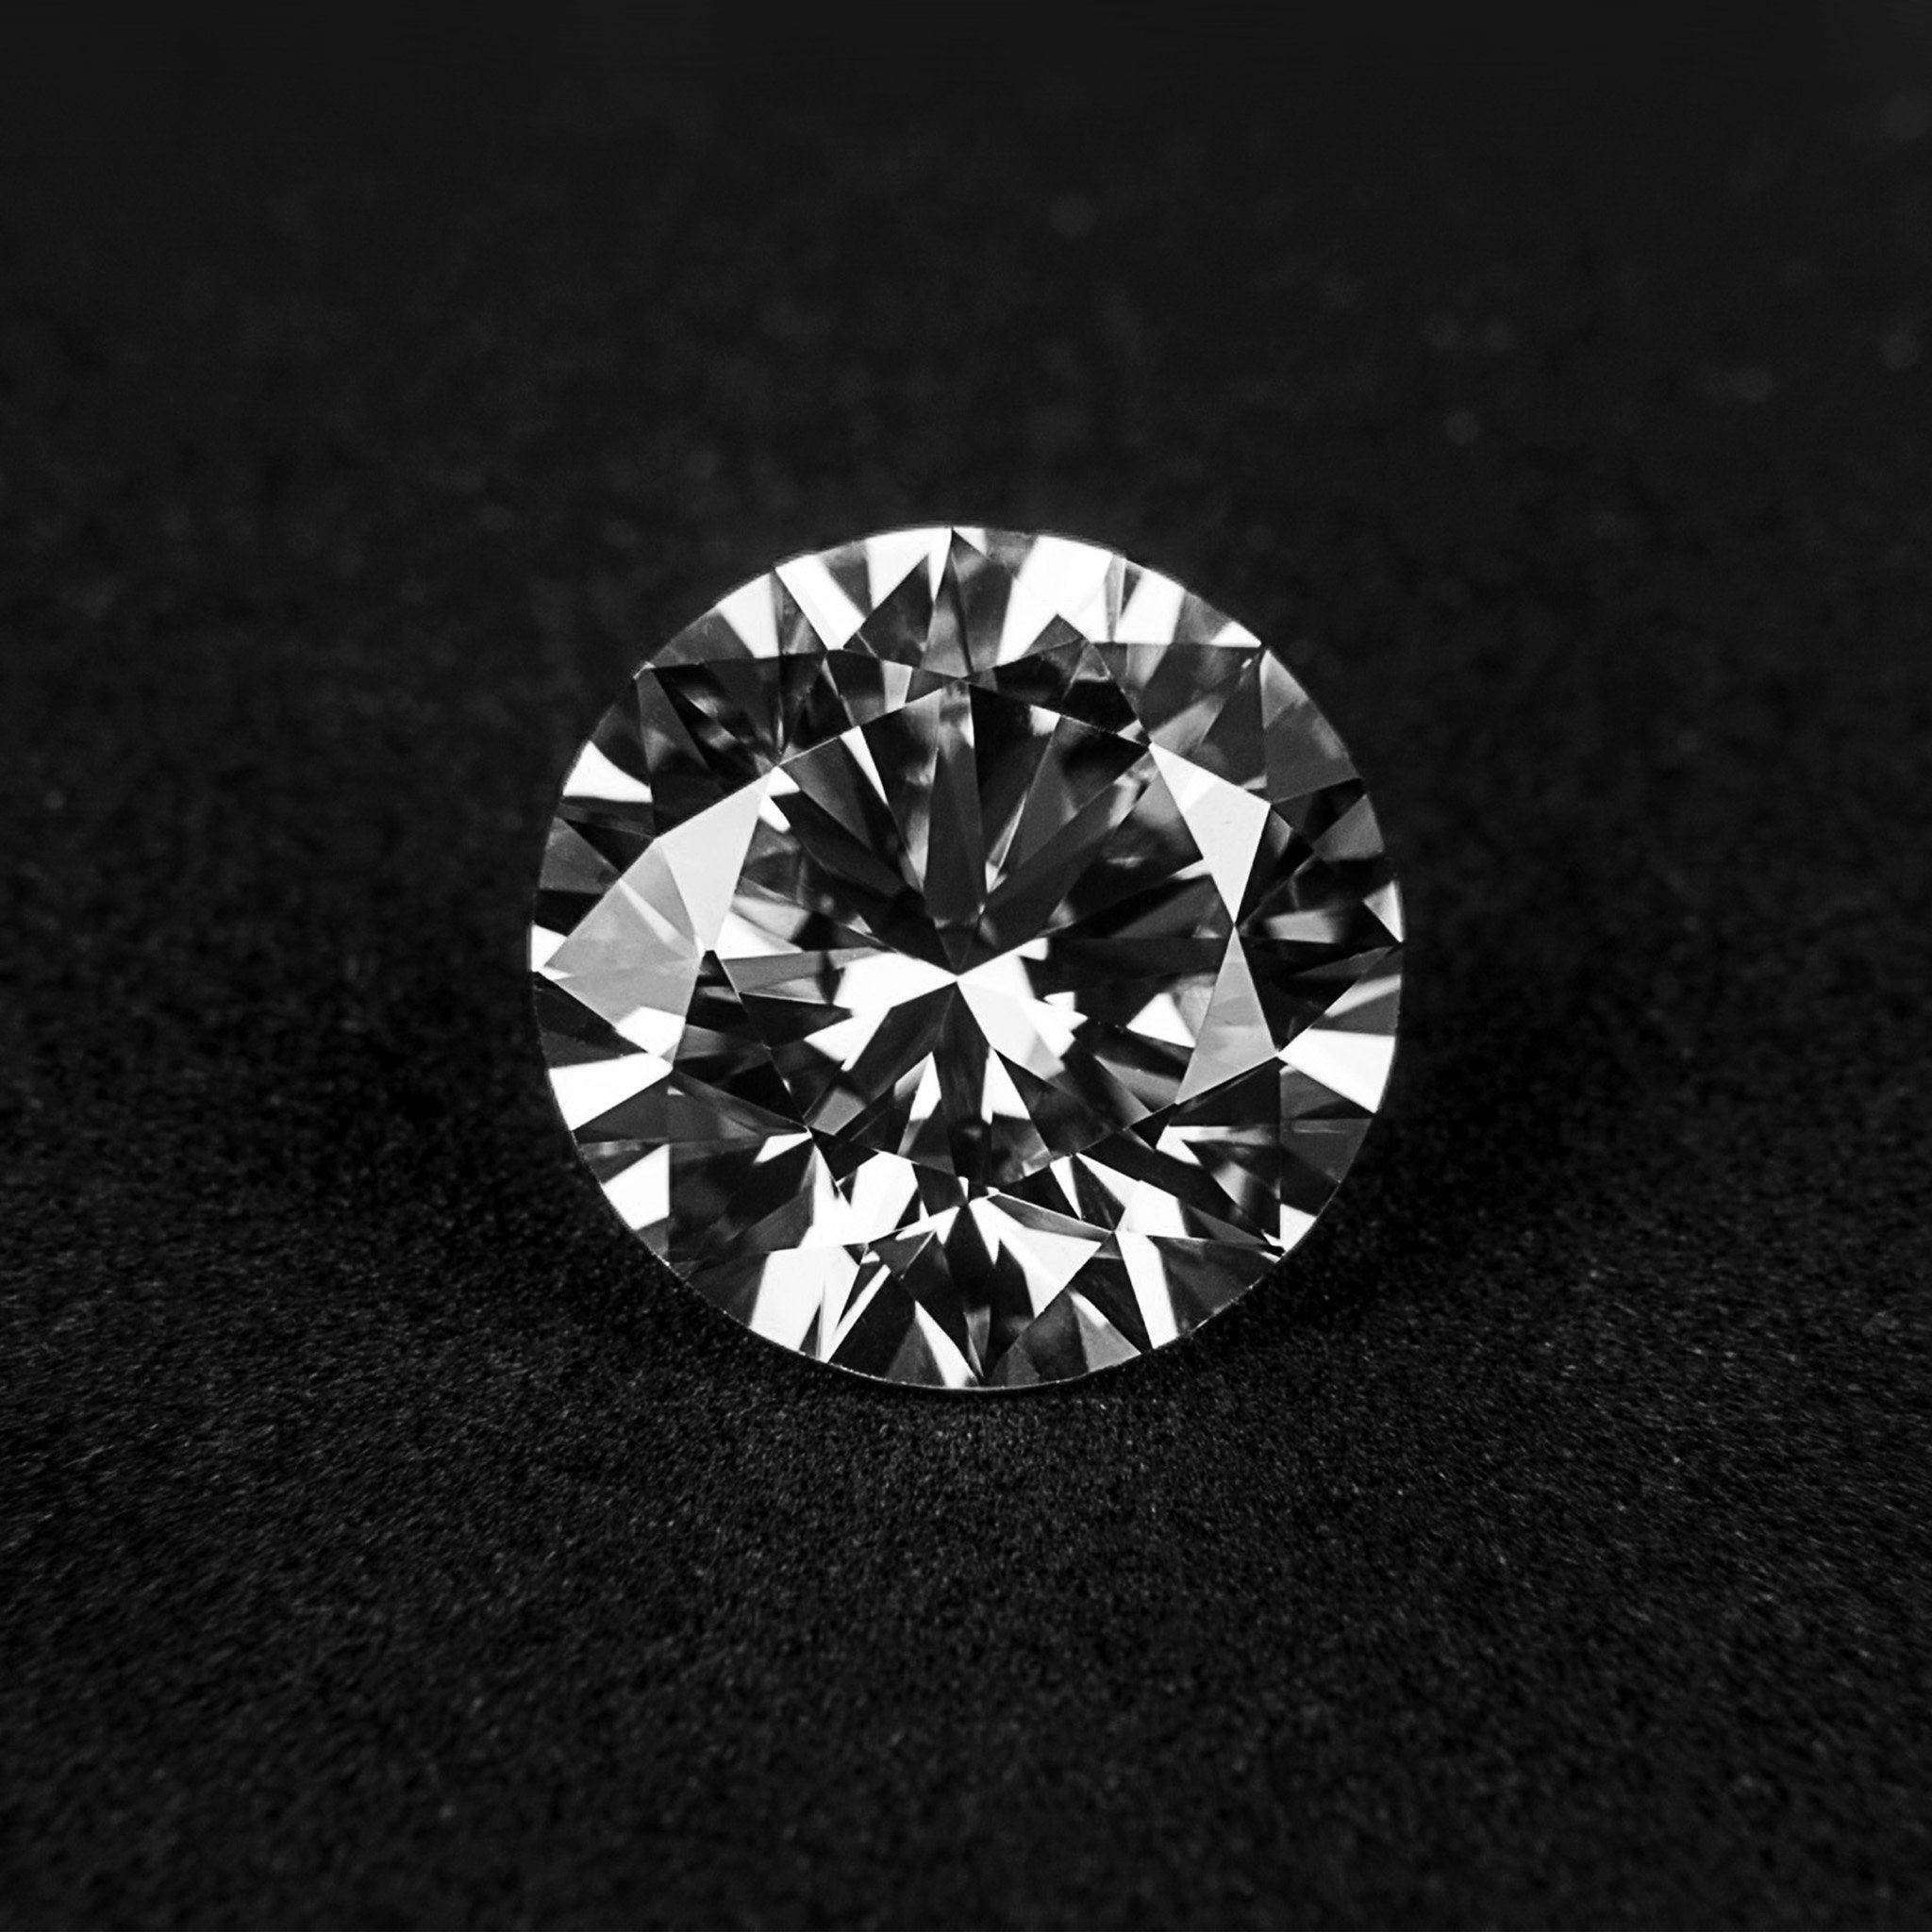 Abstract Diamonds Polygon Dark Honorable Sparkle Ipad Air